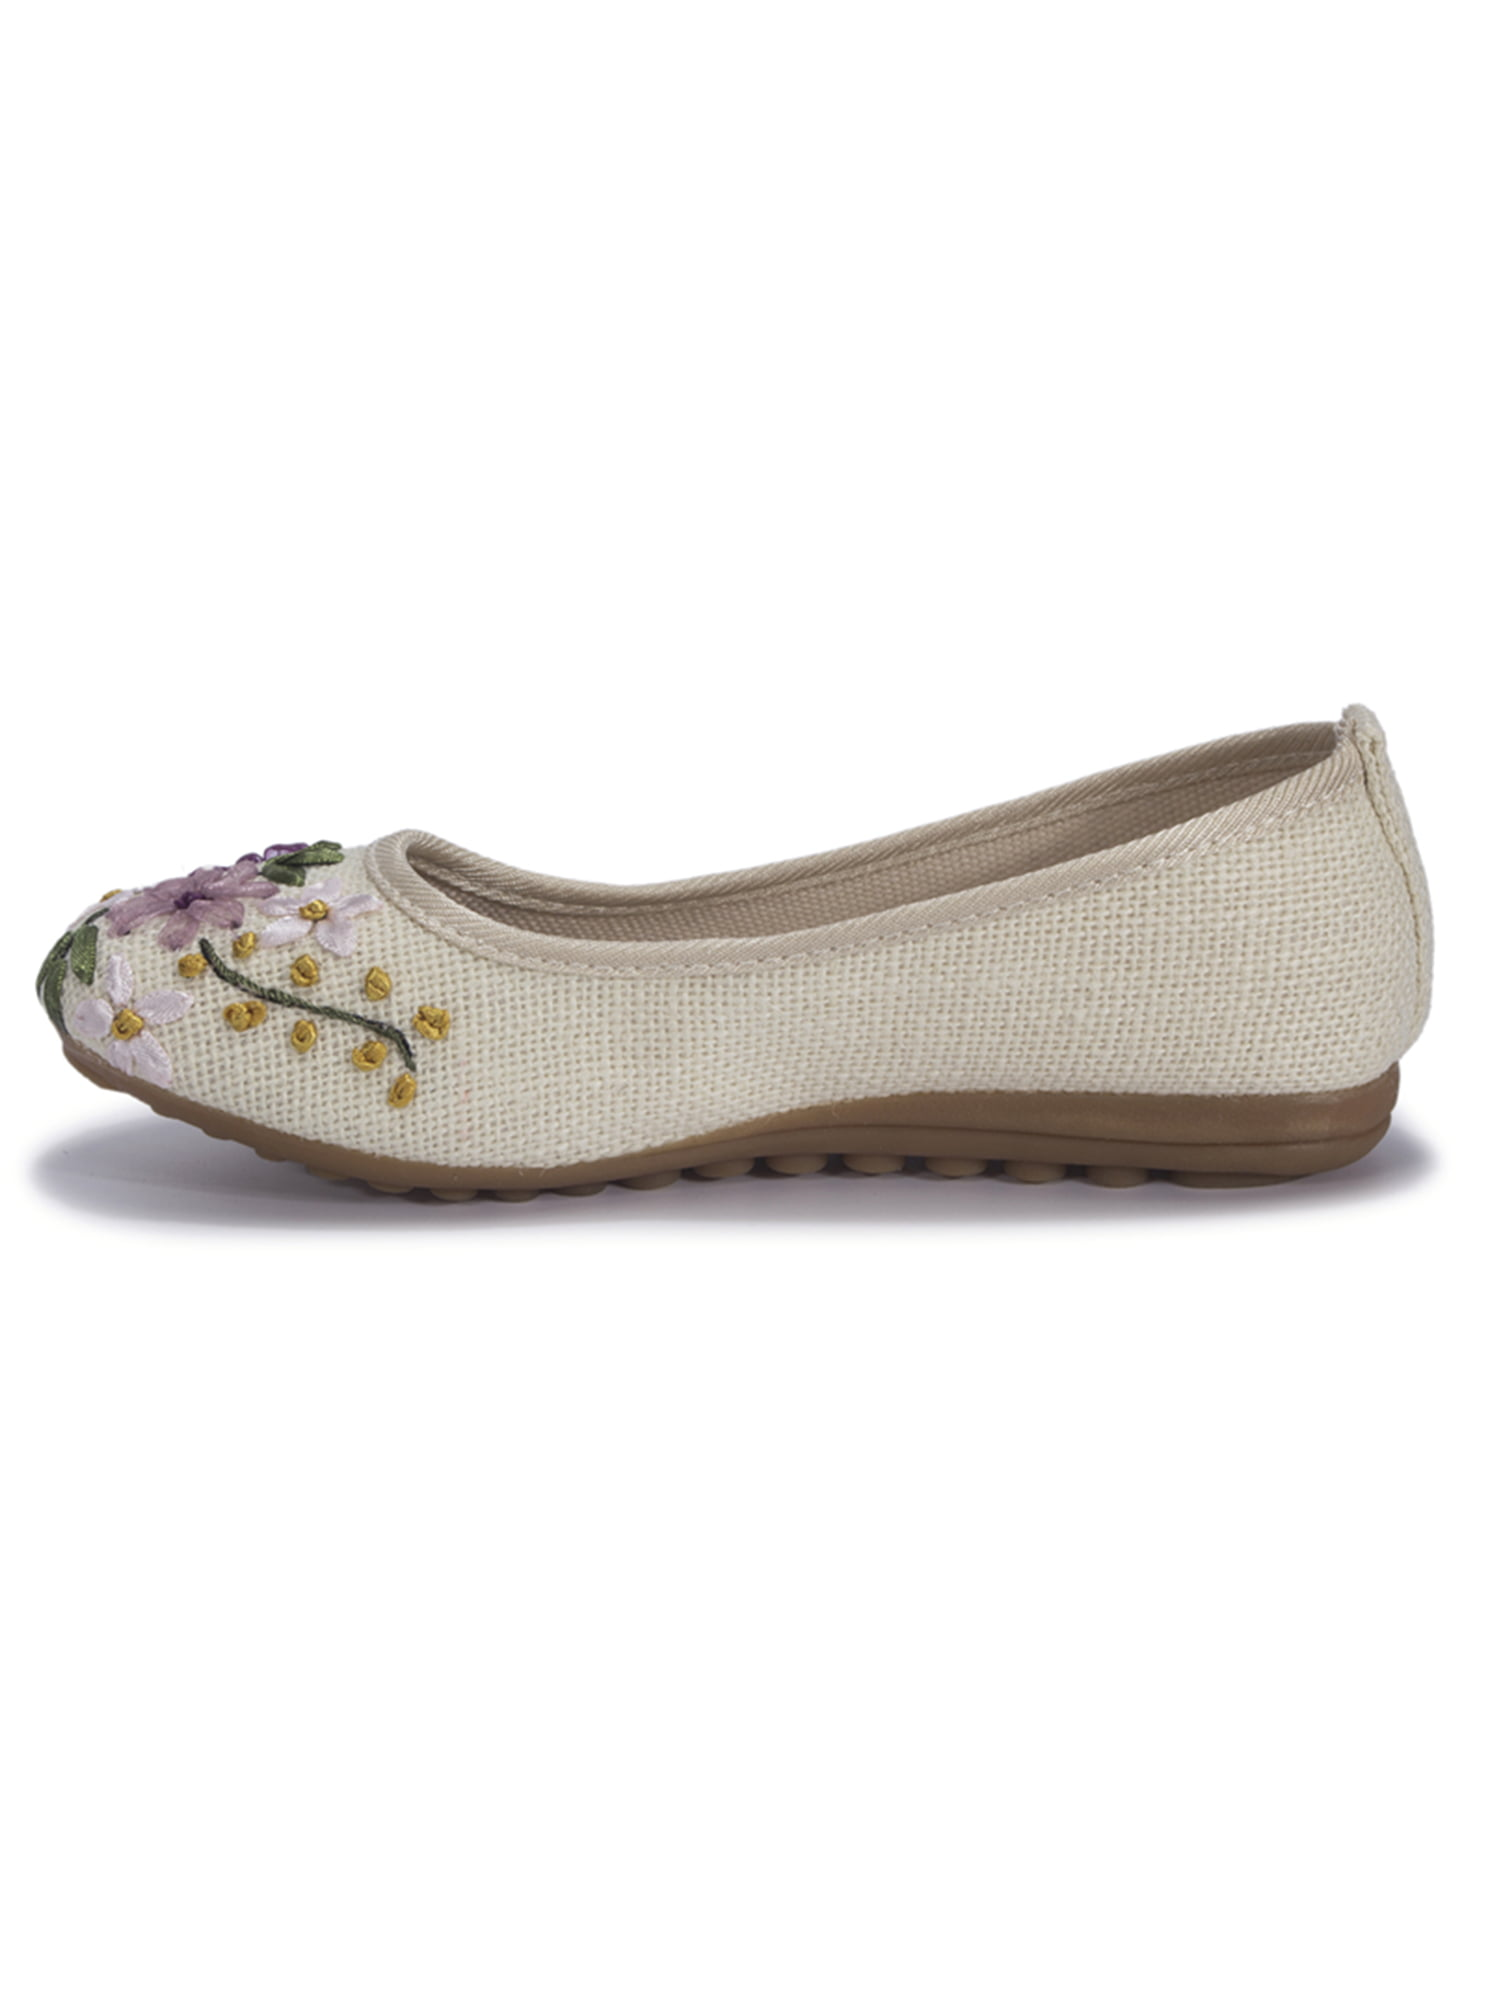 Casual Non-Slip Flat Walking Shoes